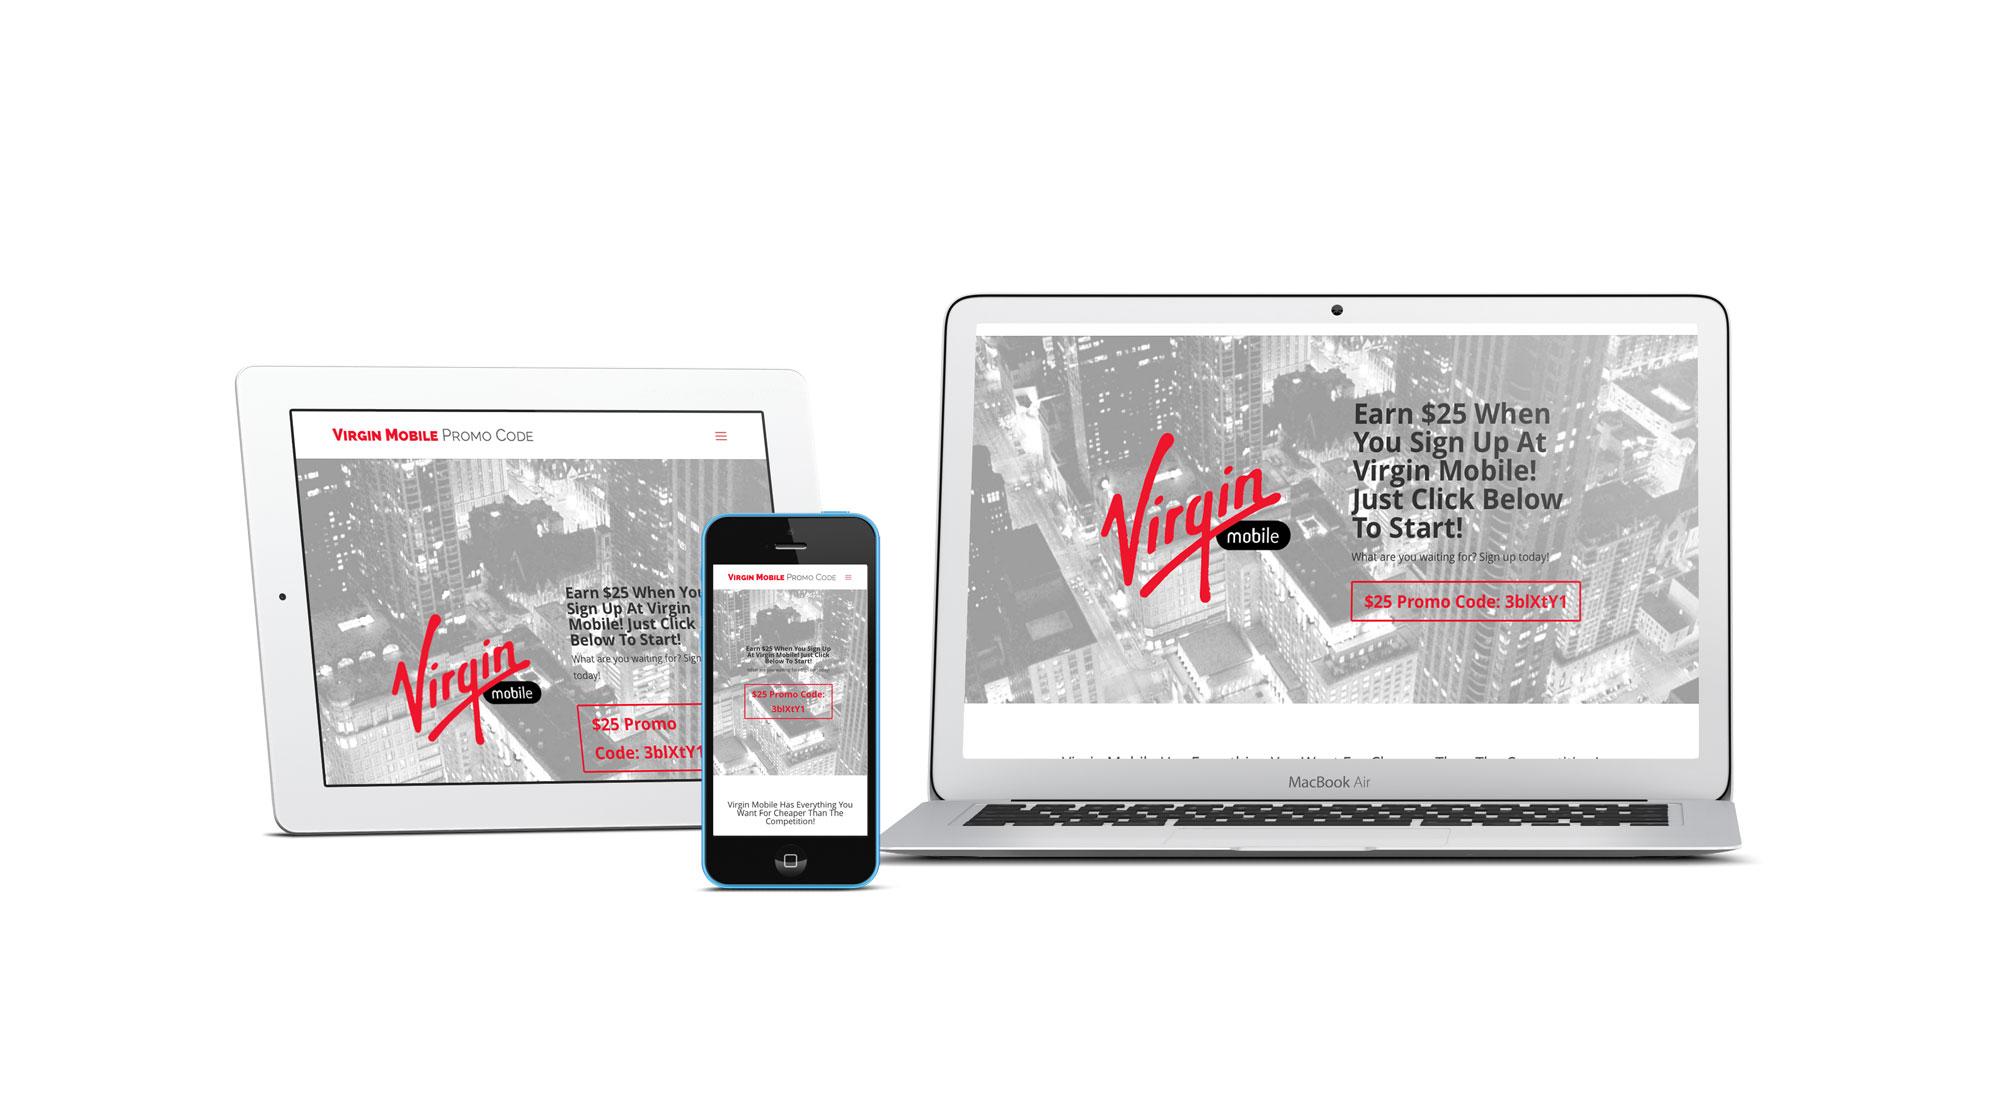 Virgin Mobile Promotional Discount Code Information Website